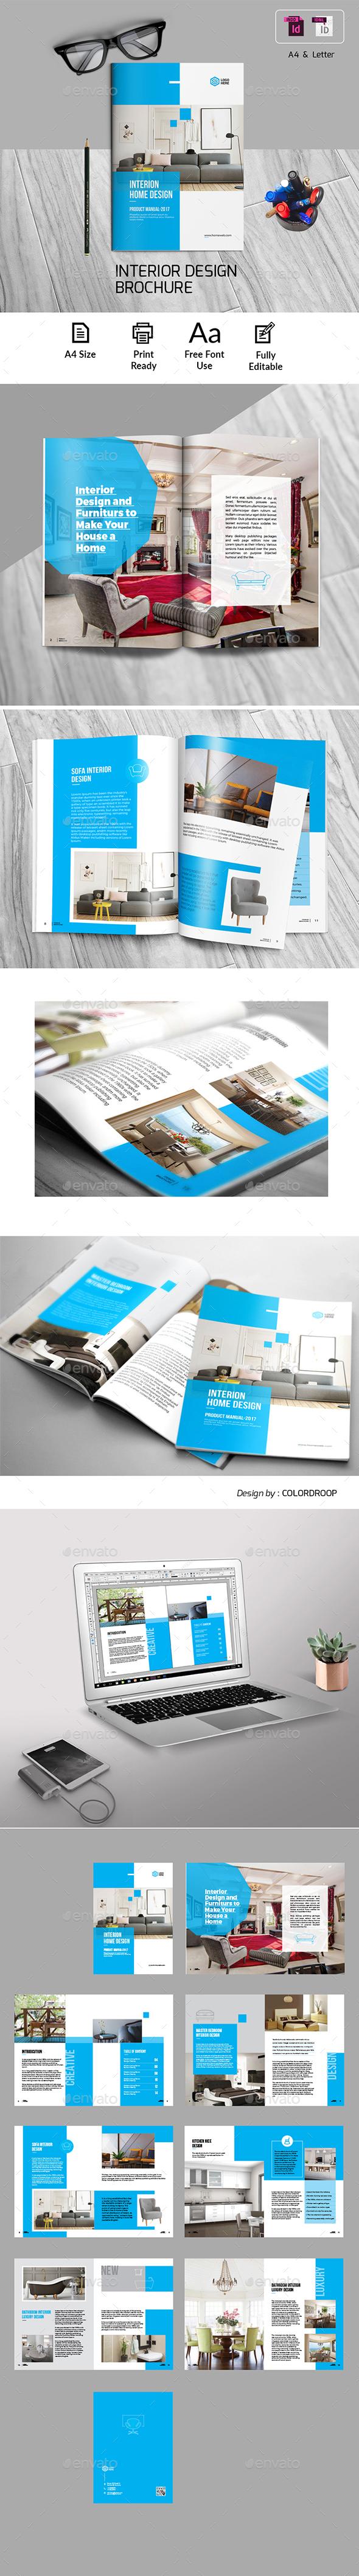 Interior Catalog Design - Corporate Brochures